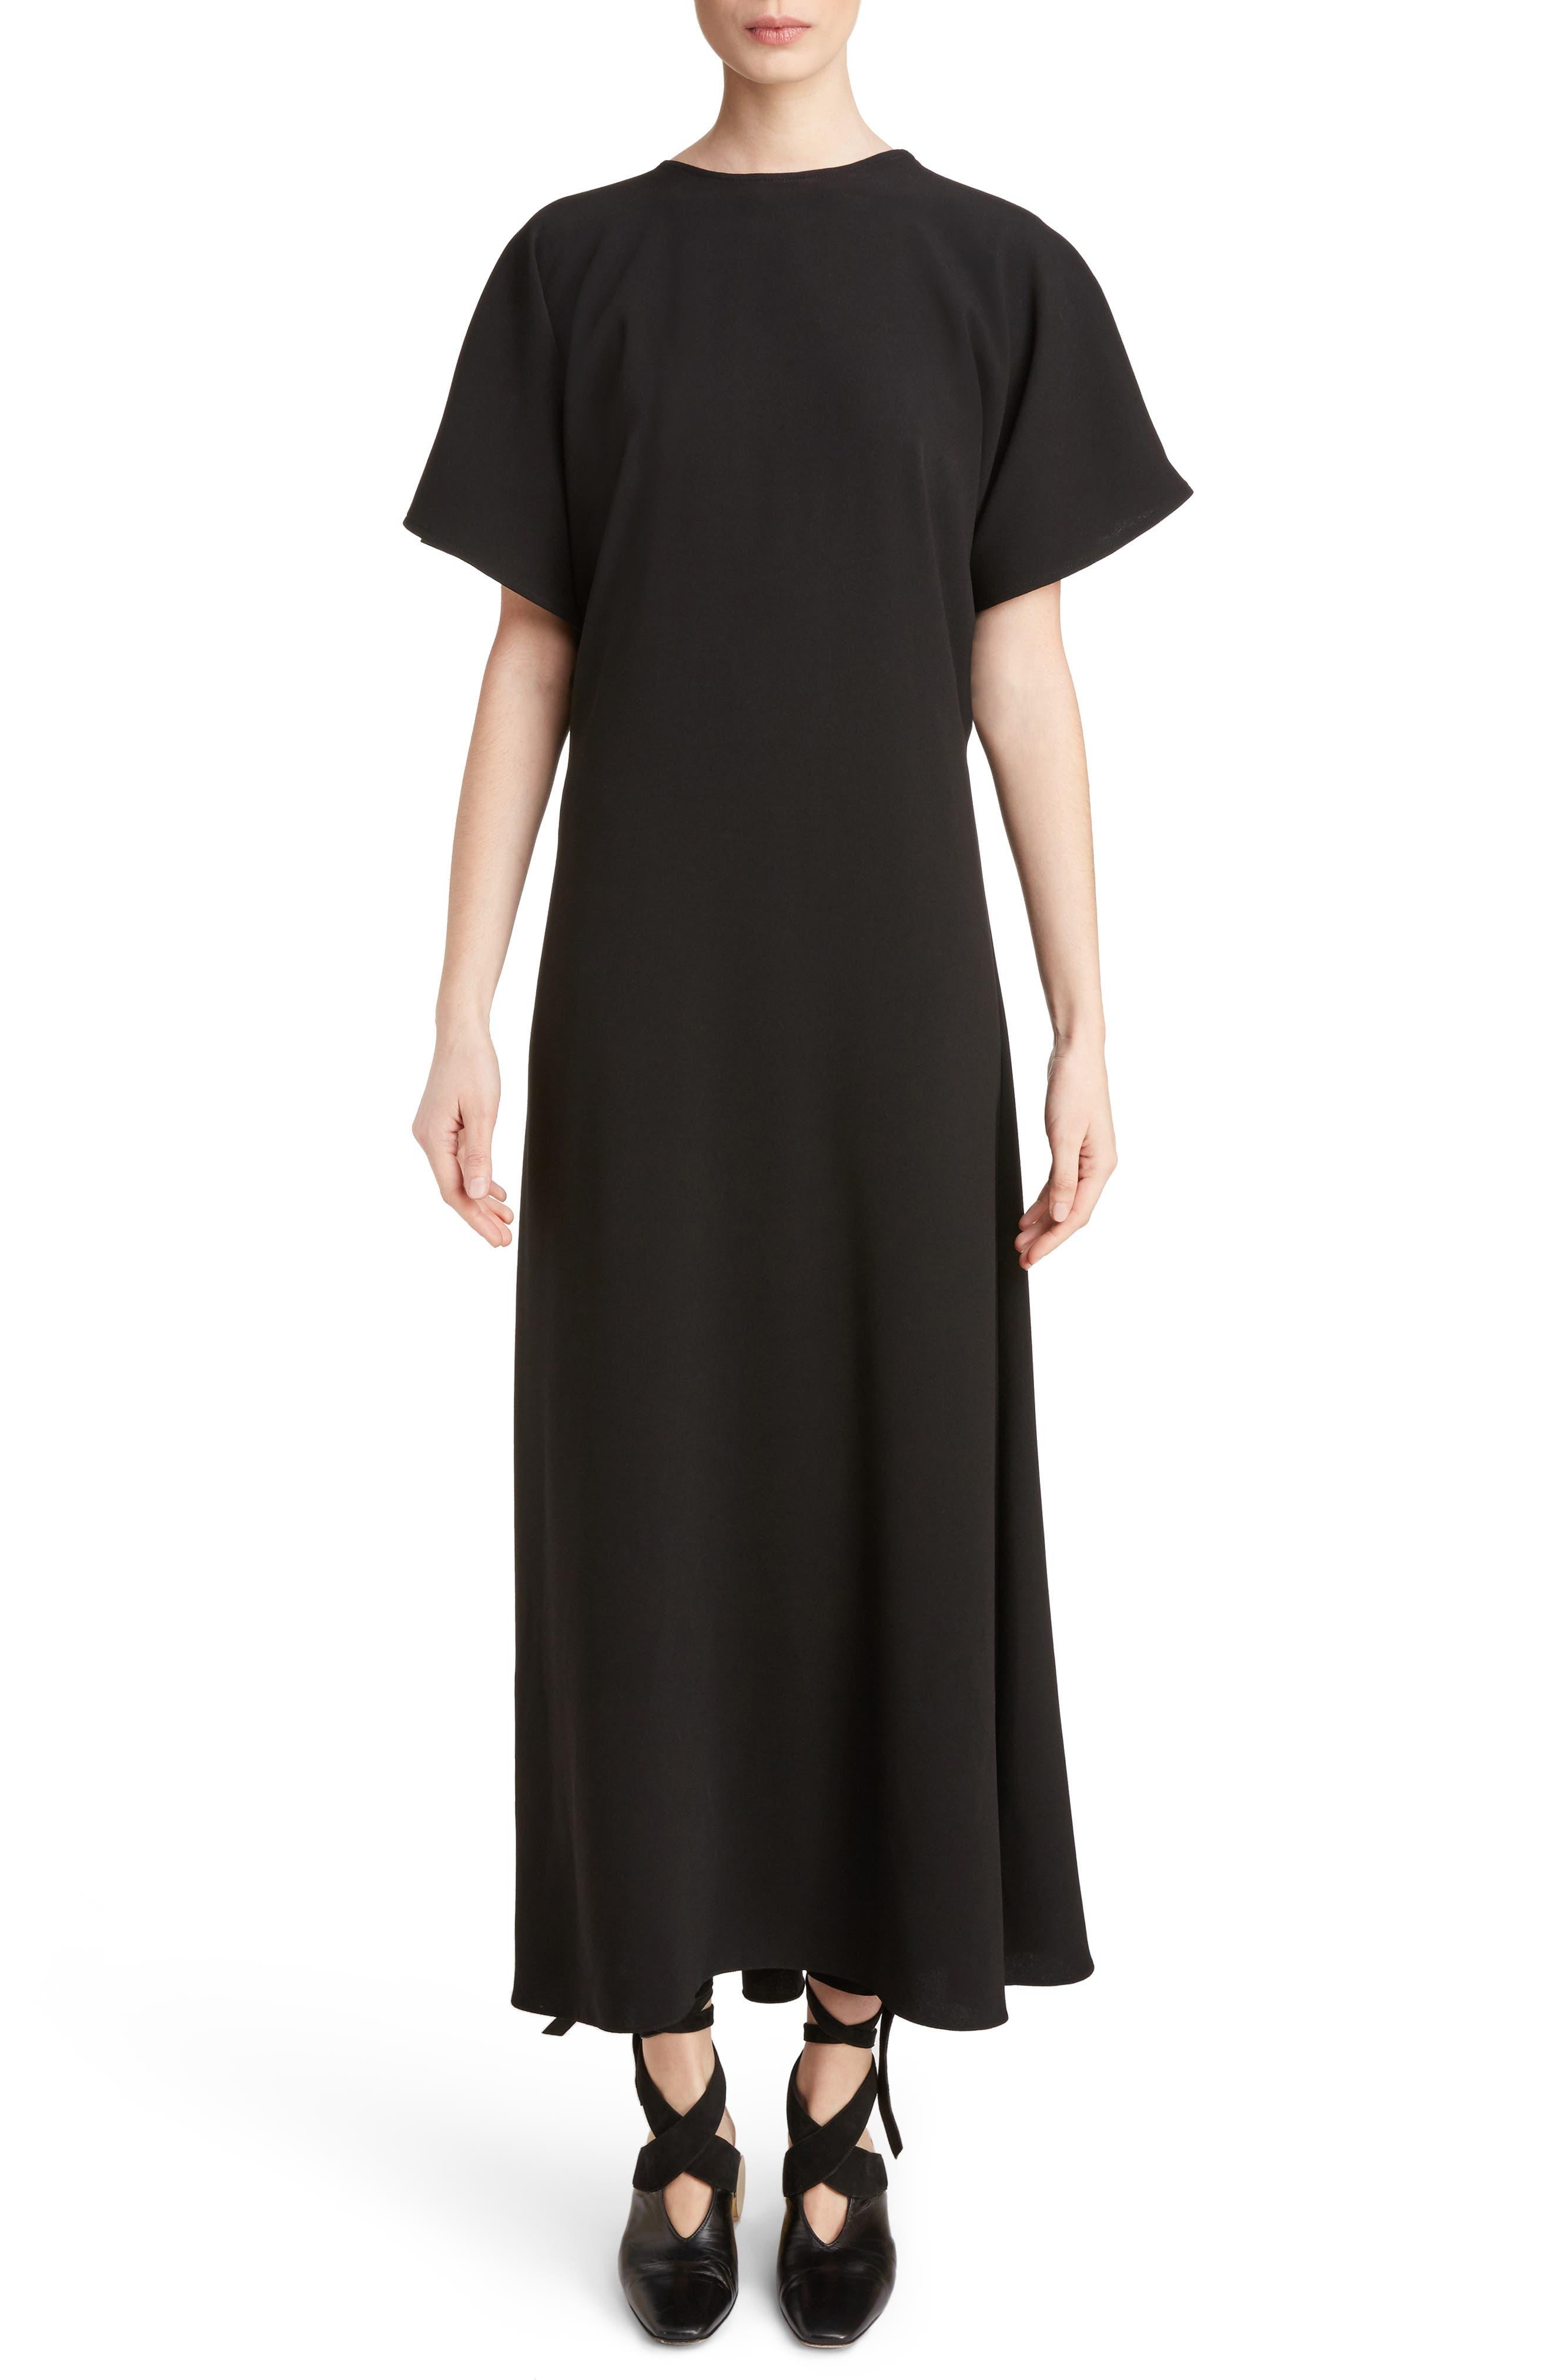 J.W.ANDERSON Cap Sleeve Maxi Dress,                             Main thumbnail 1, color,                             001